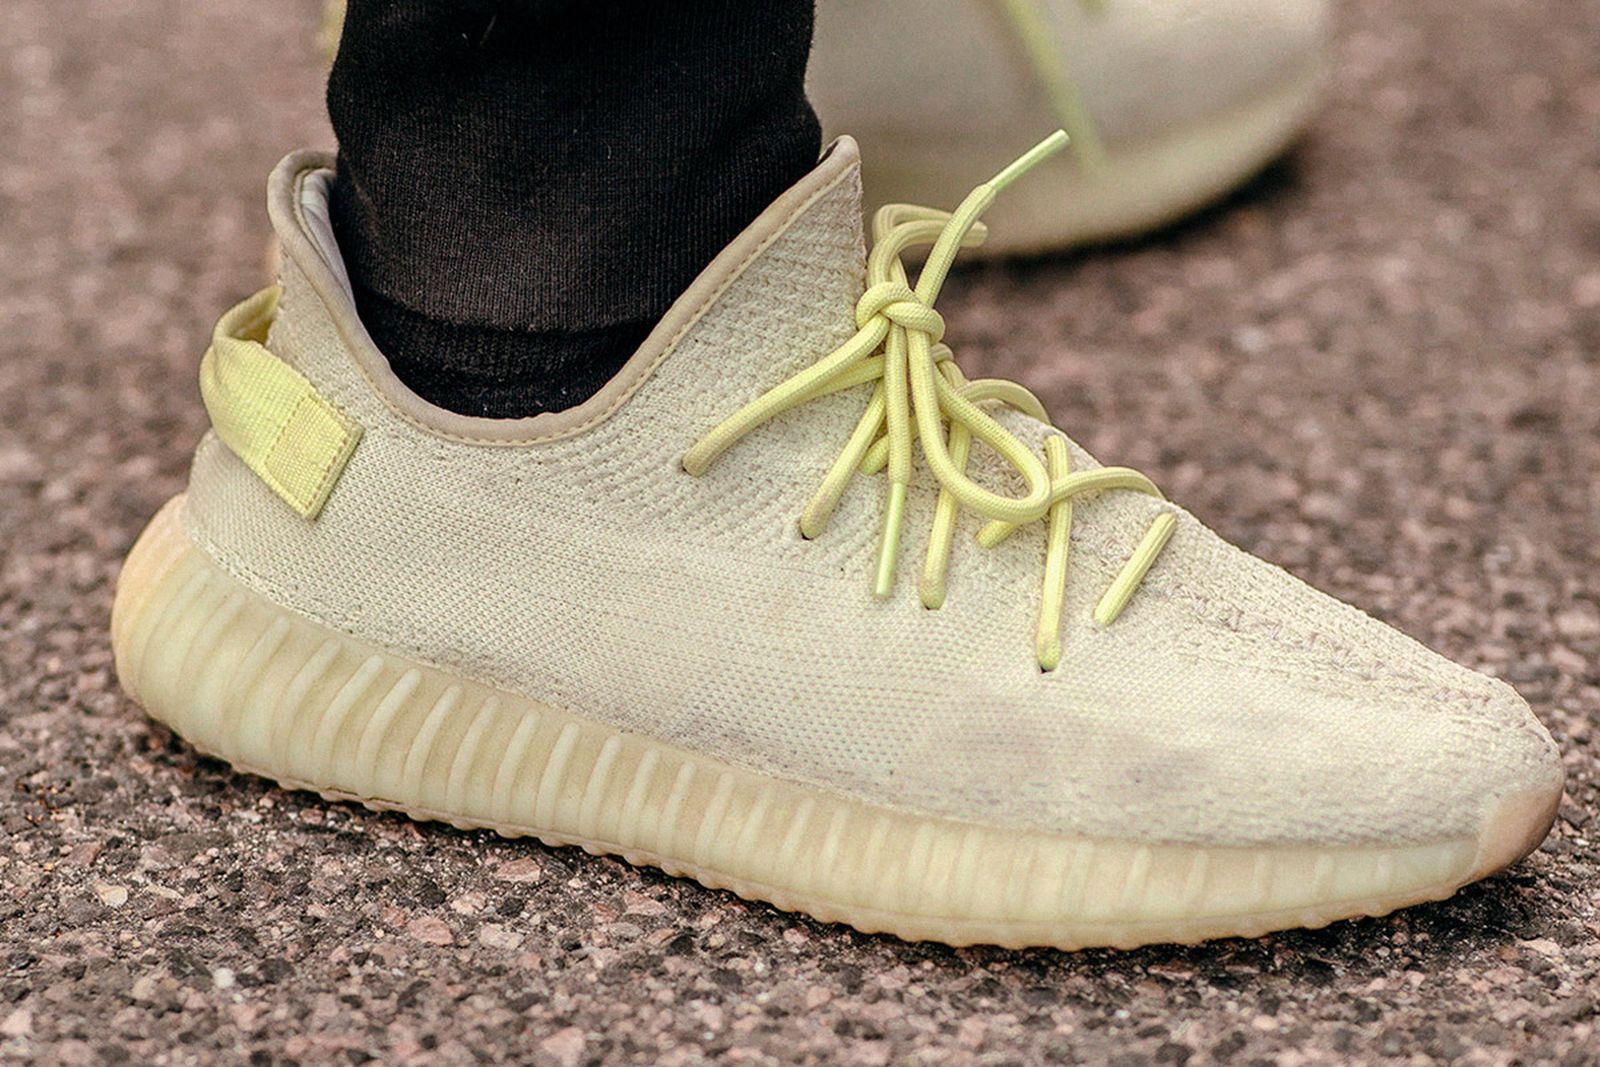 ebay sneaker designer goods prices Gucci OFF-WHITE c/o Virgil Abloh yeezy